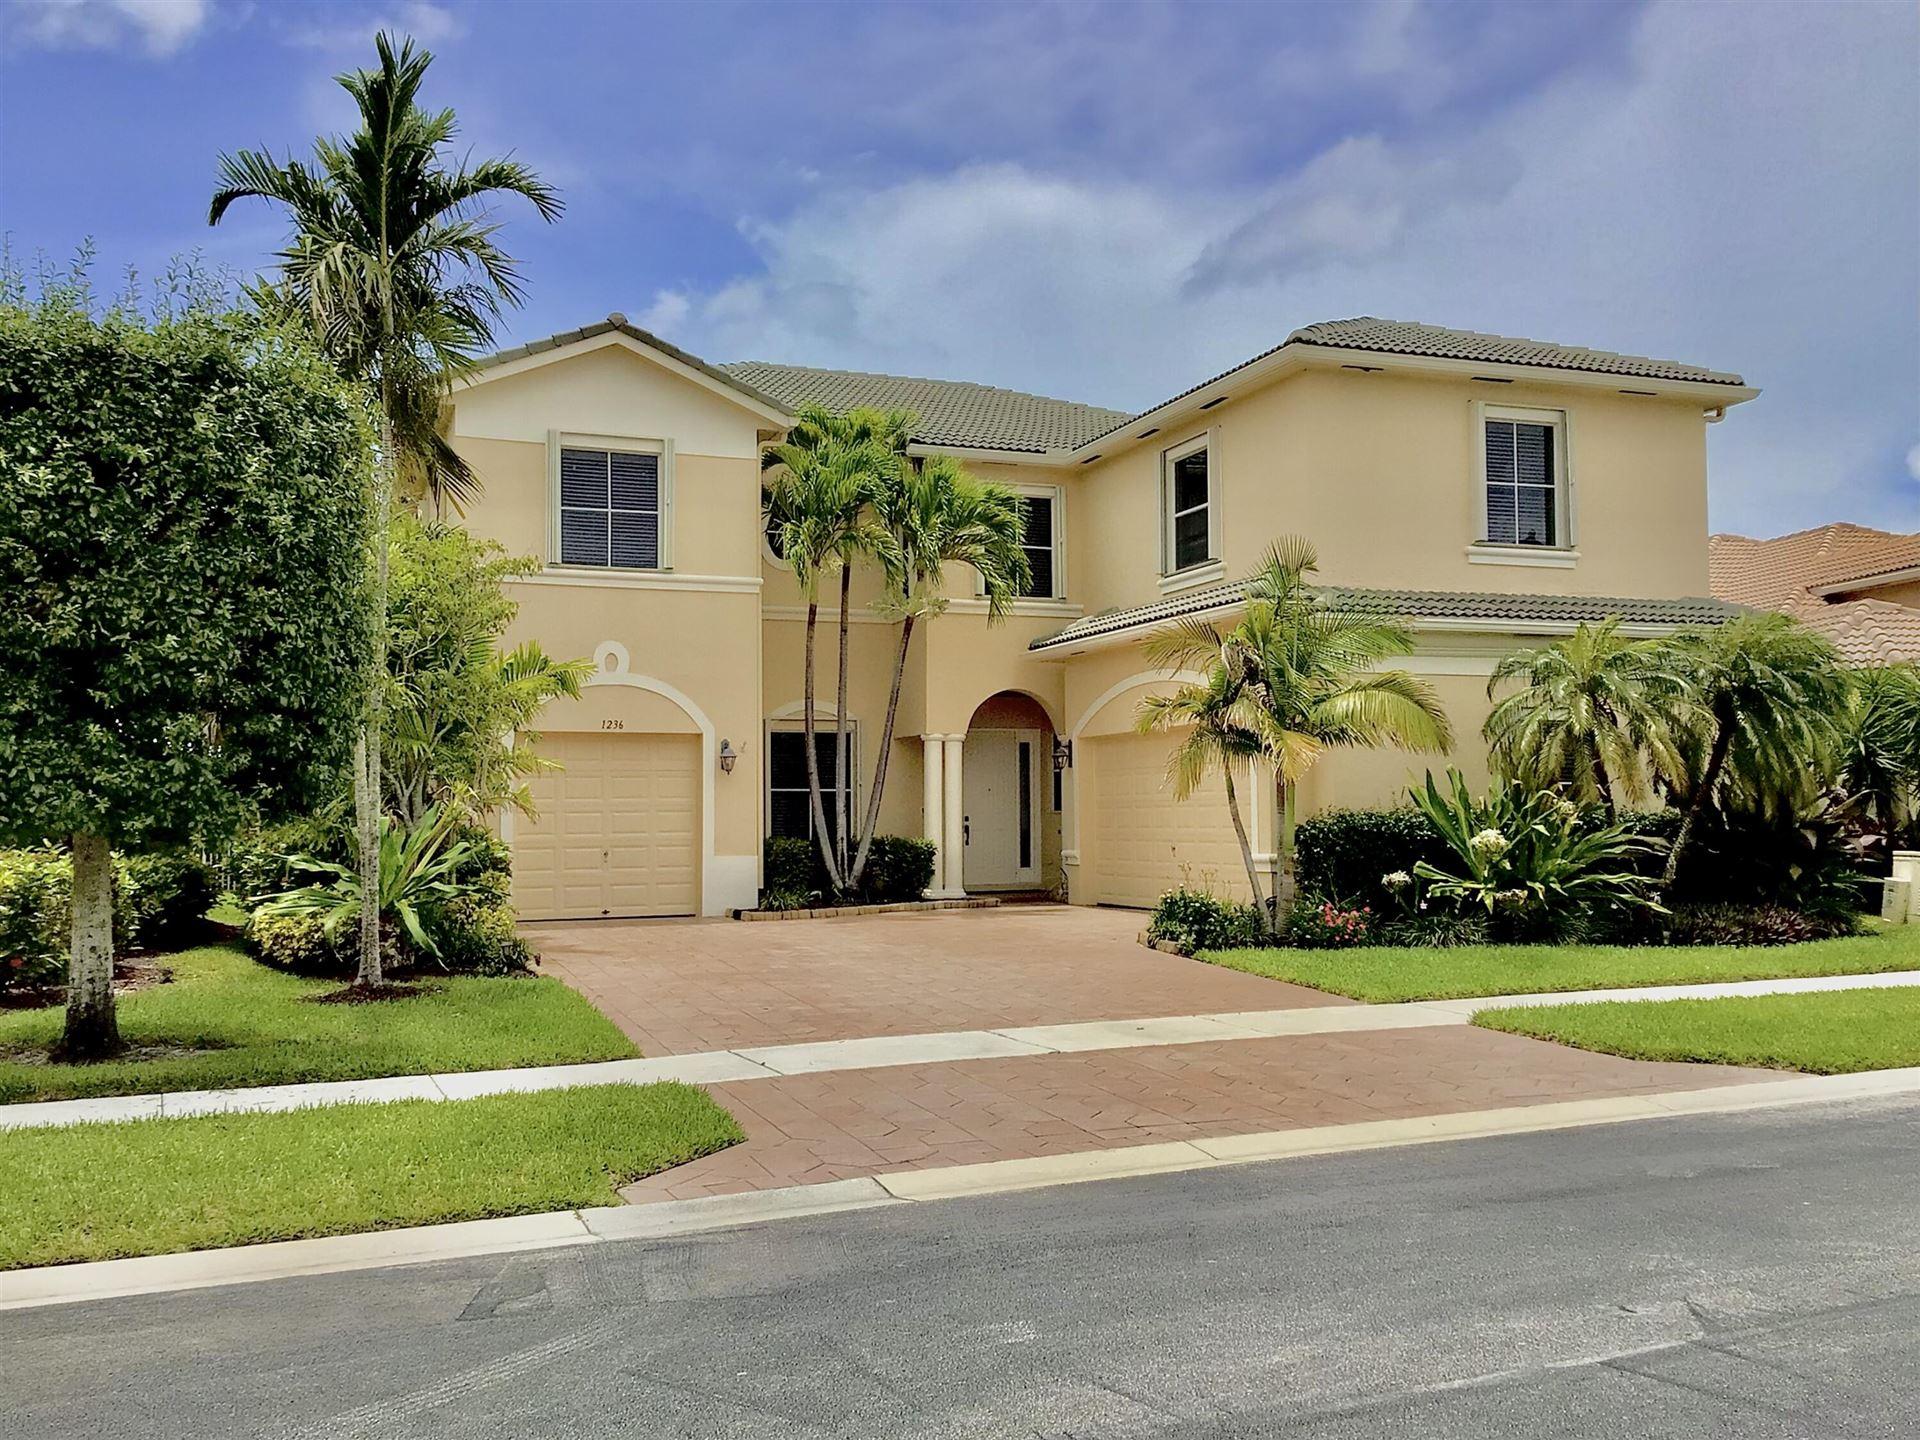 1236 Bay View Way, Wellington, FL 33414 - MLS#: RX-10734456